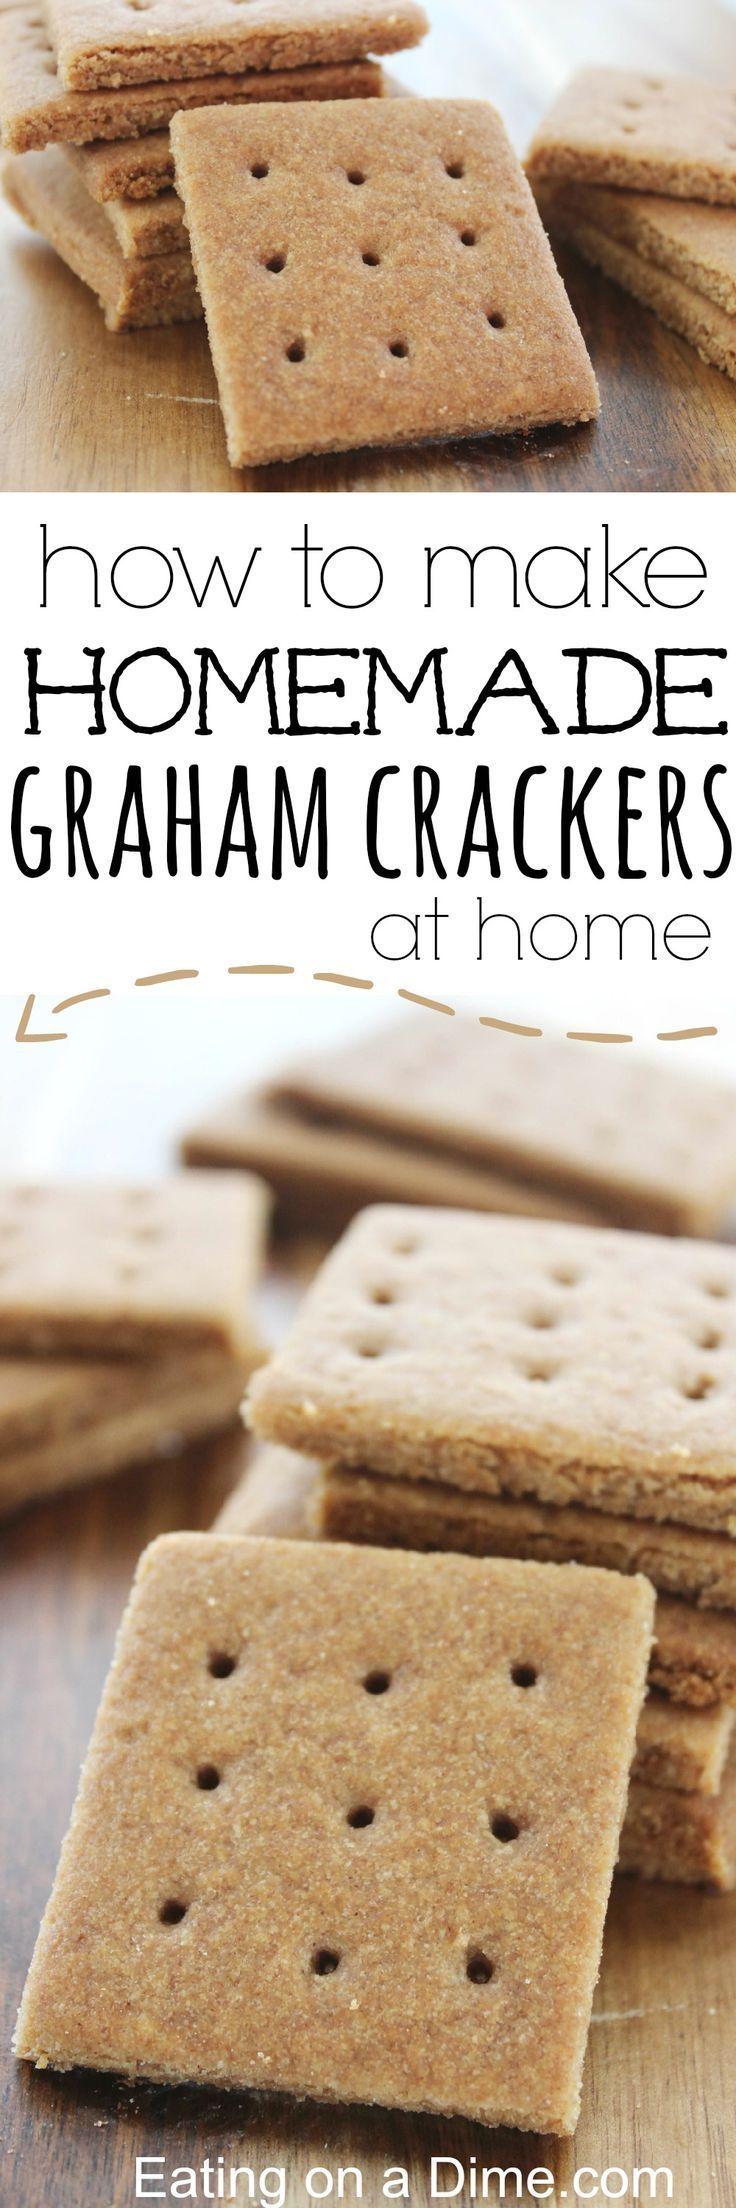 Easy to Make Homemade Graham Crackers that taste amazing.